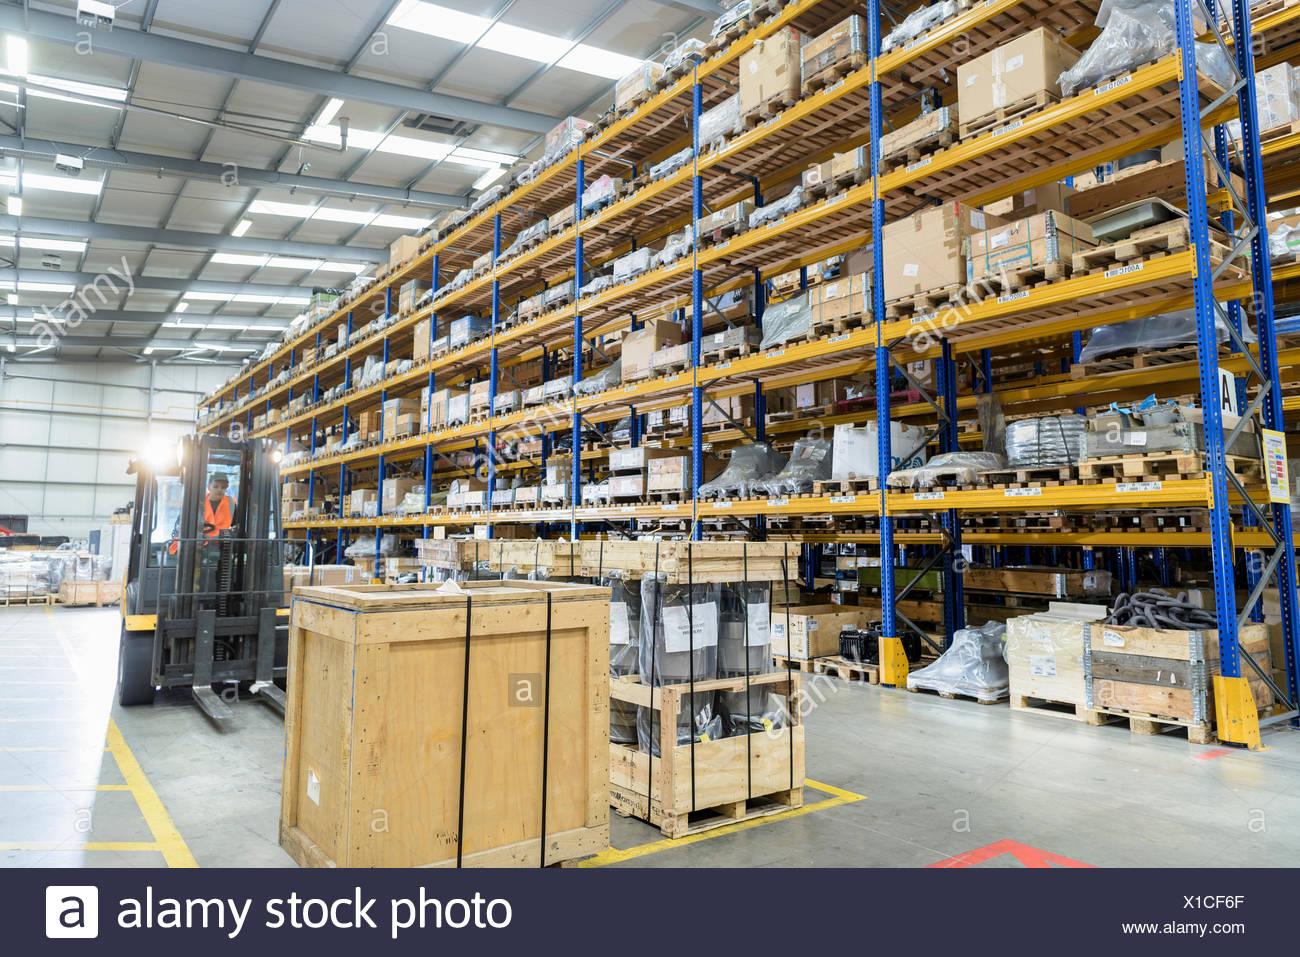 Female storage worker in train works warehouse - Stock Image